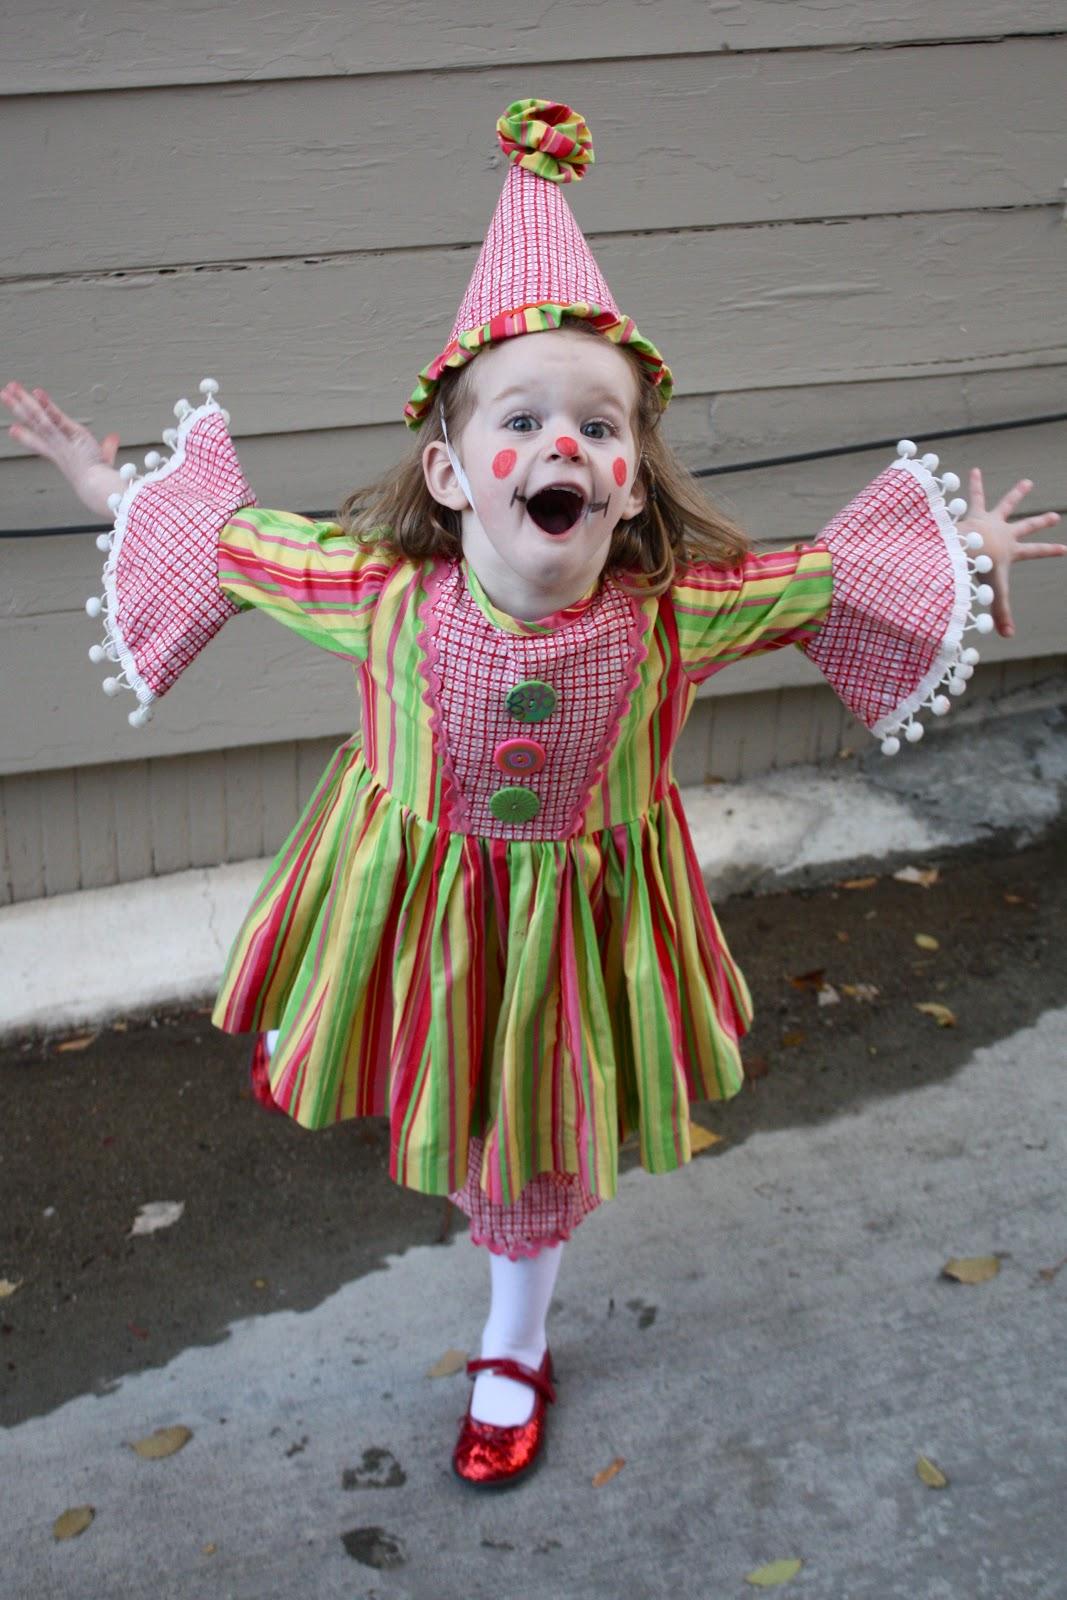 Halloween Clown Girl Outfit.At Second Street Halloween Attire